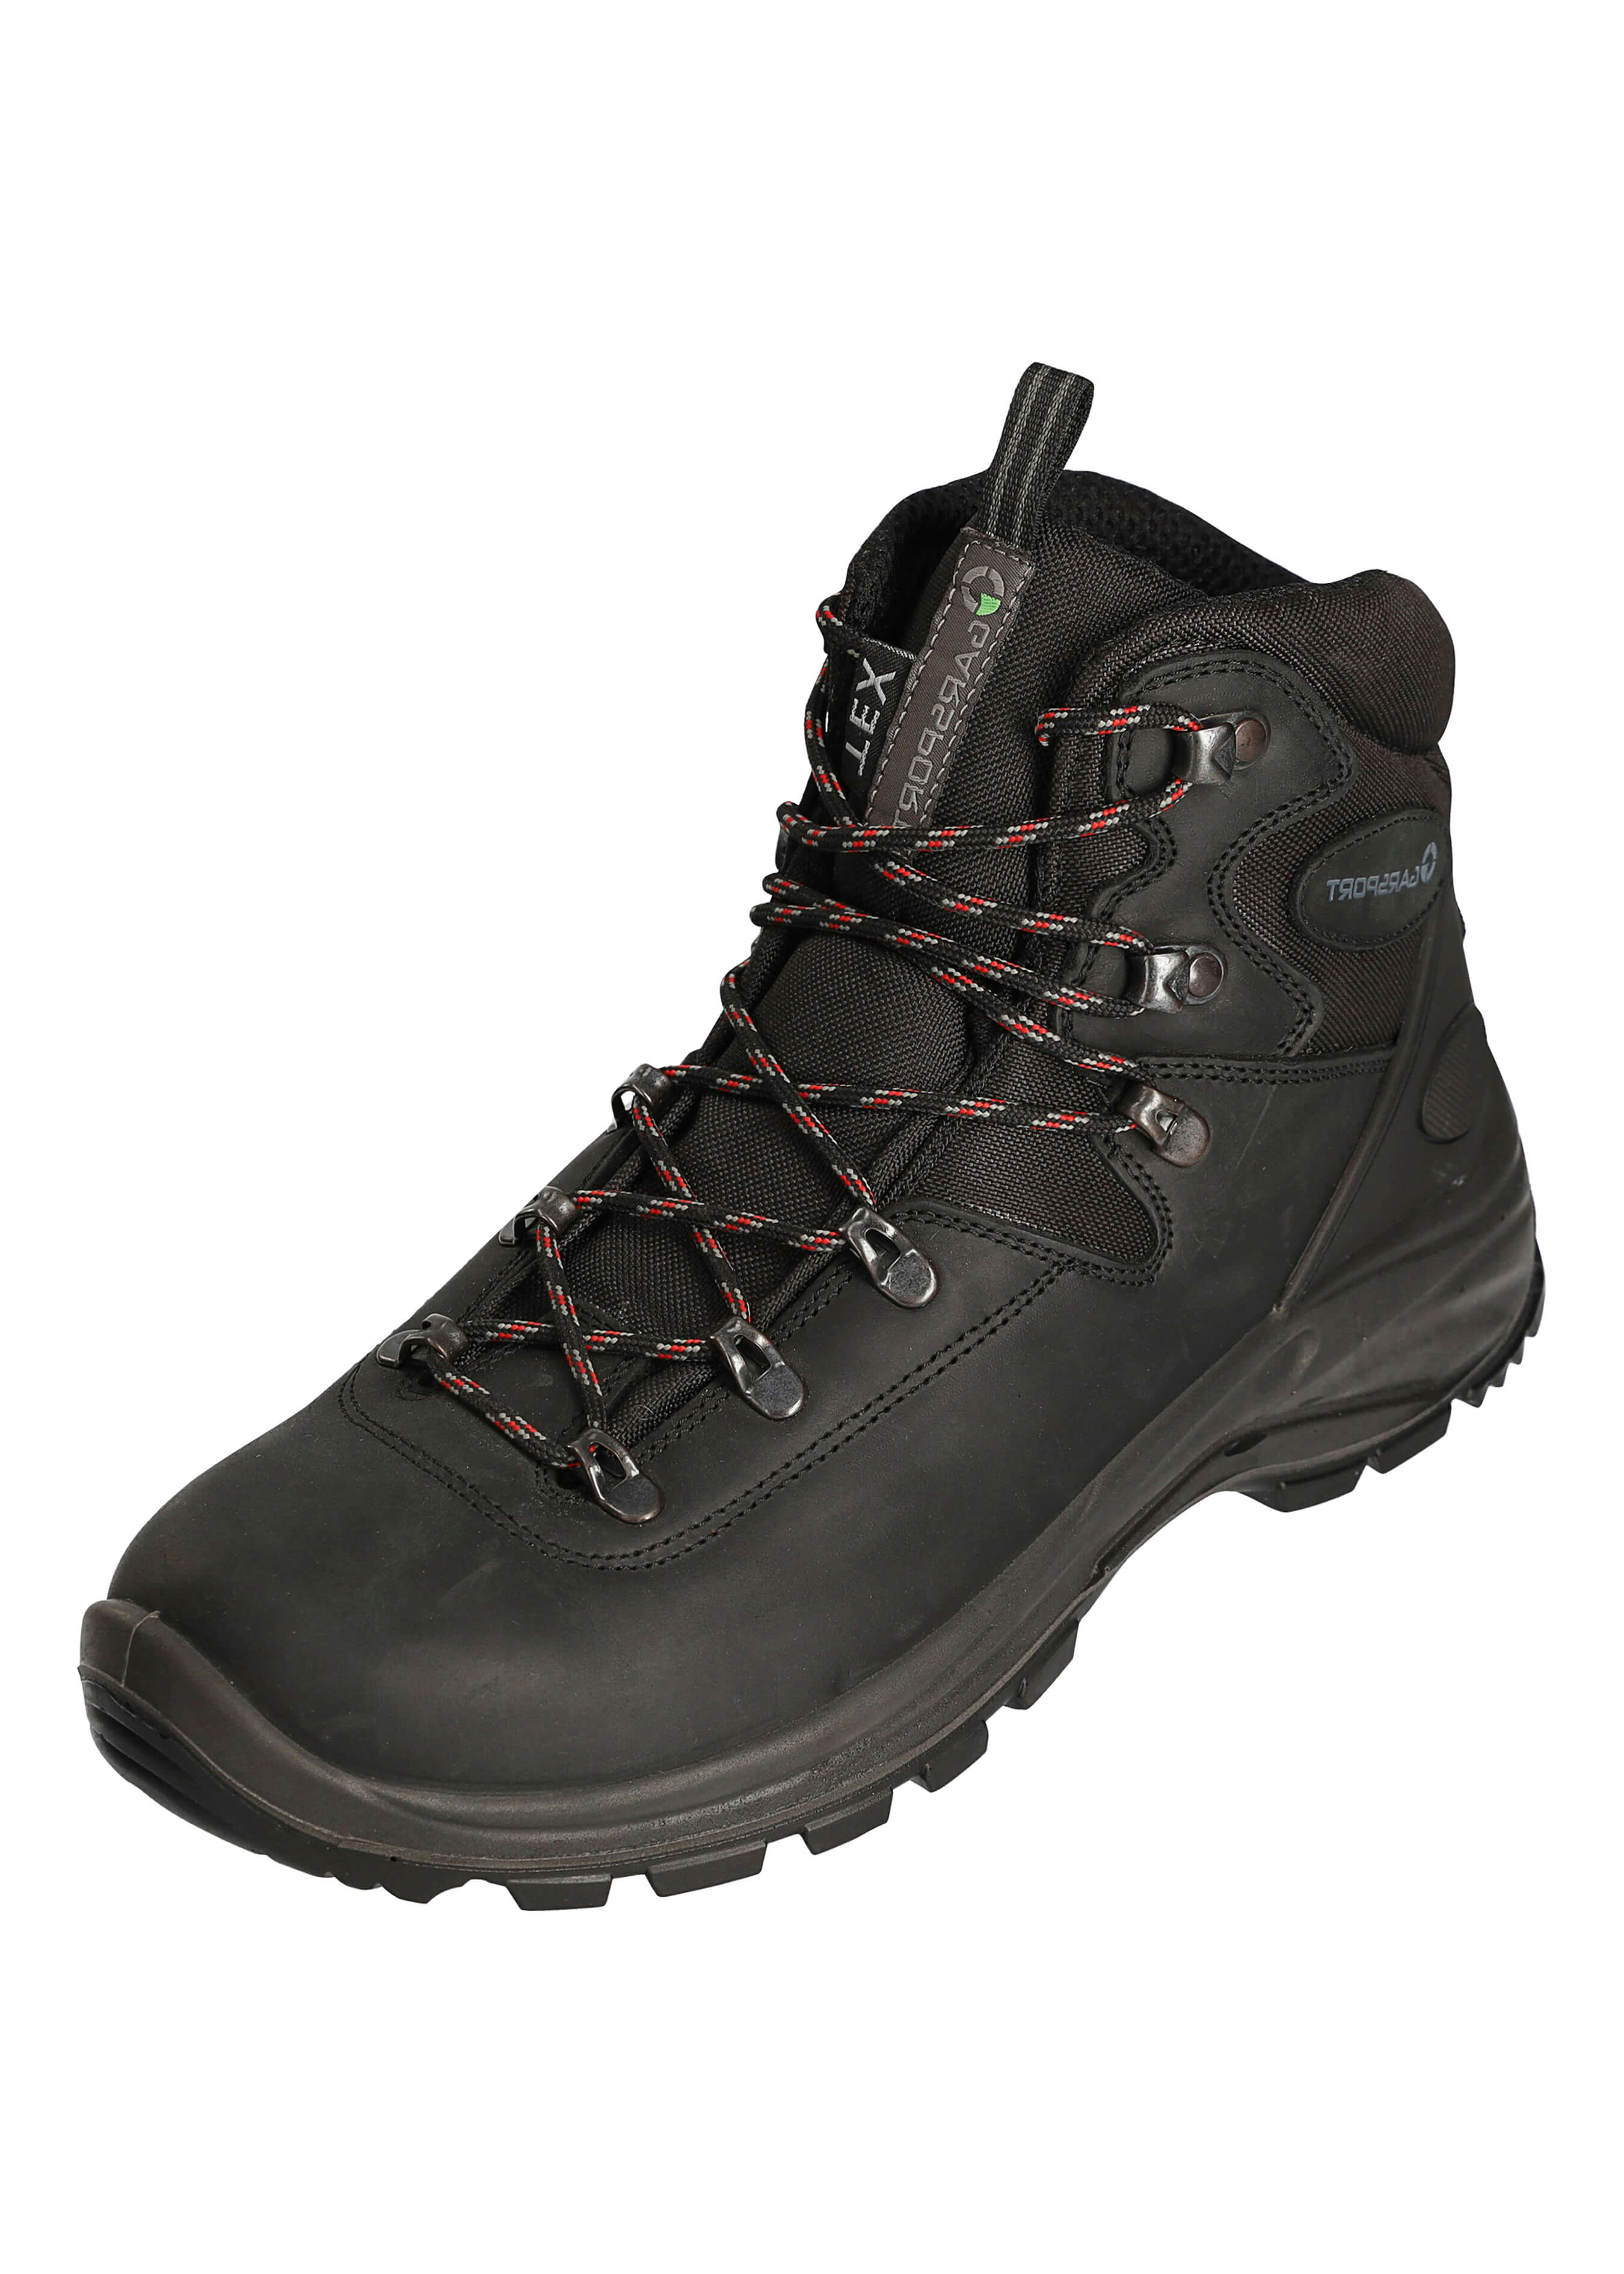 Chaussure de travail polyvalente Falcade 42791036 1